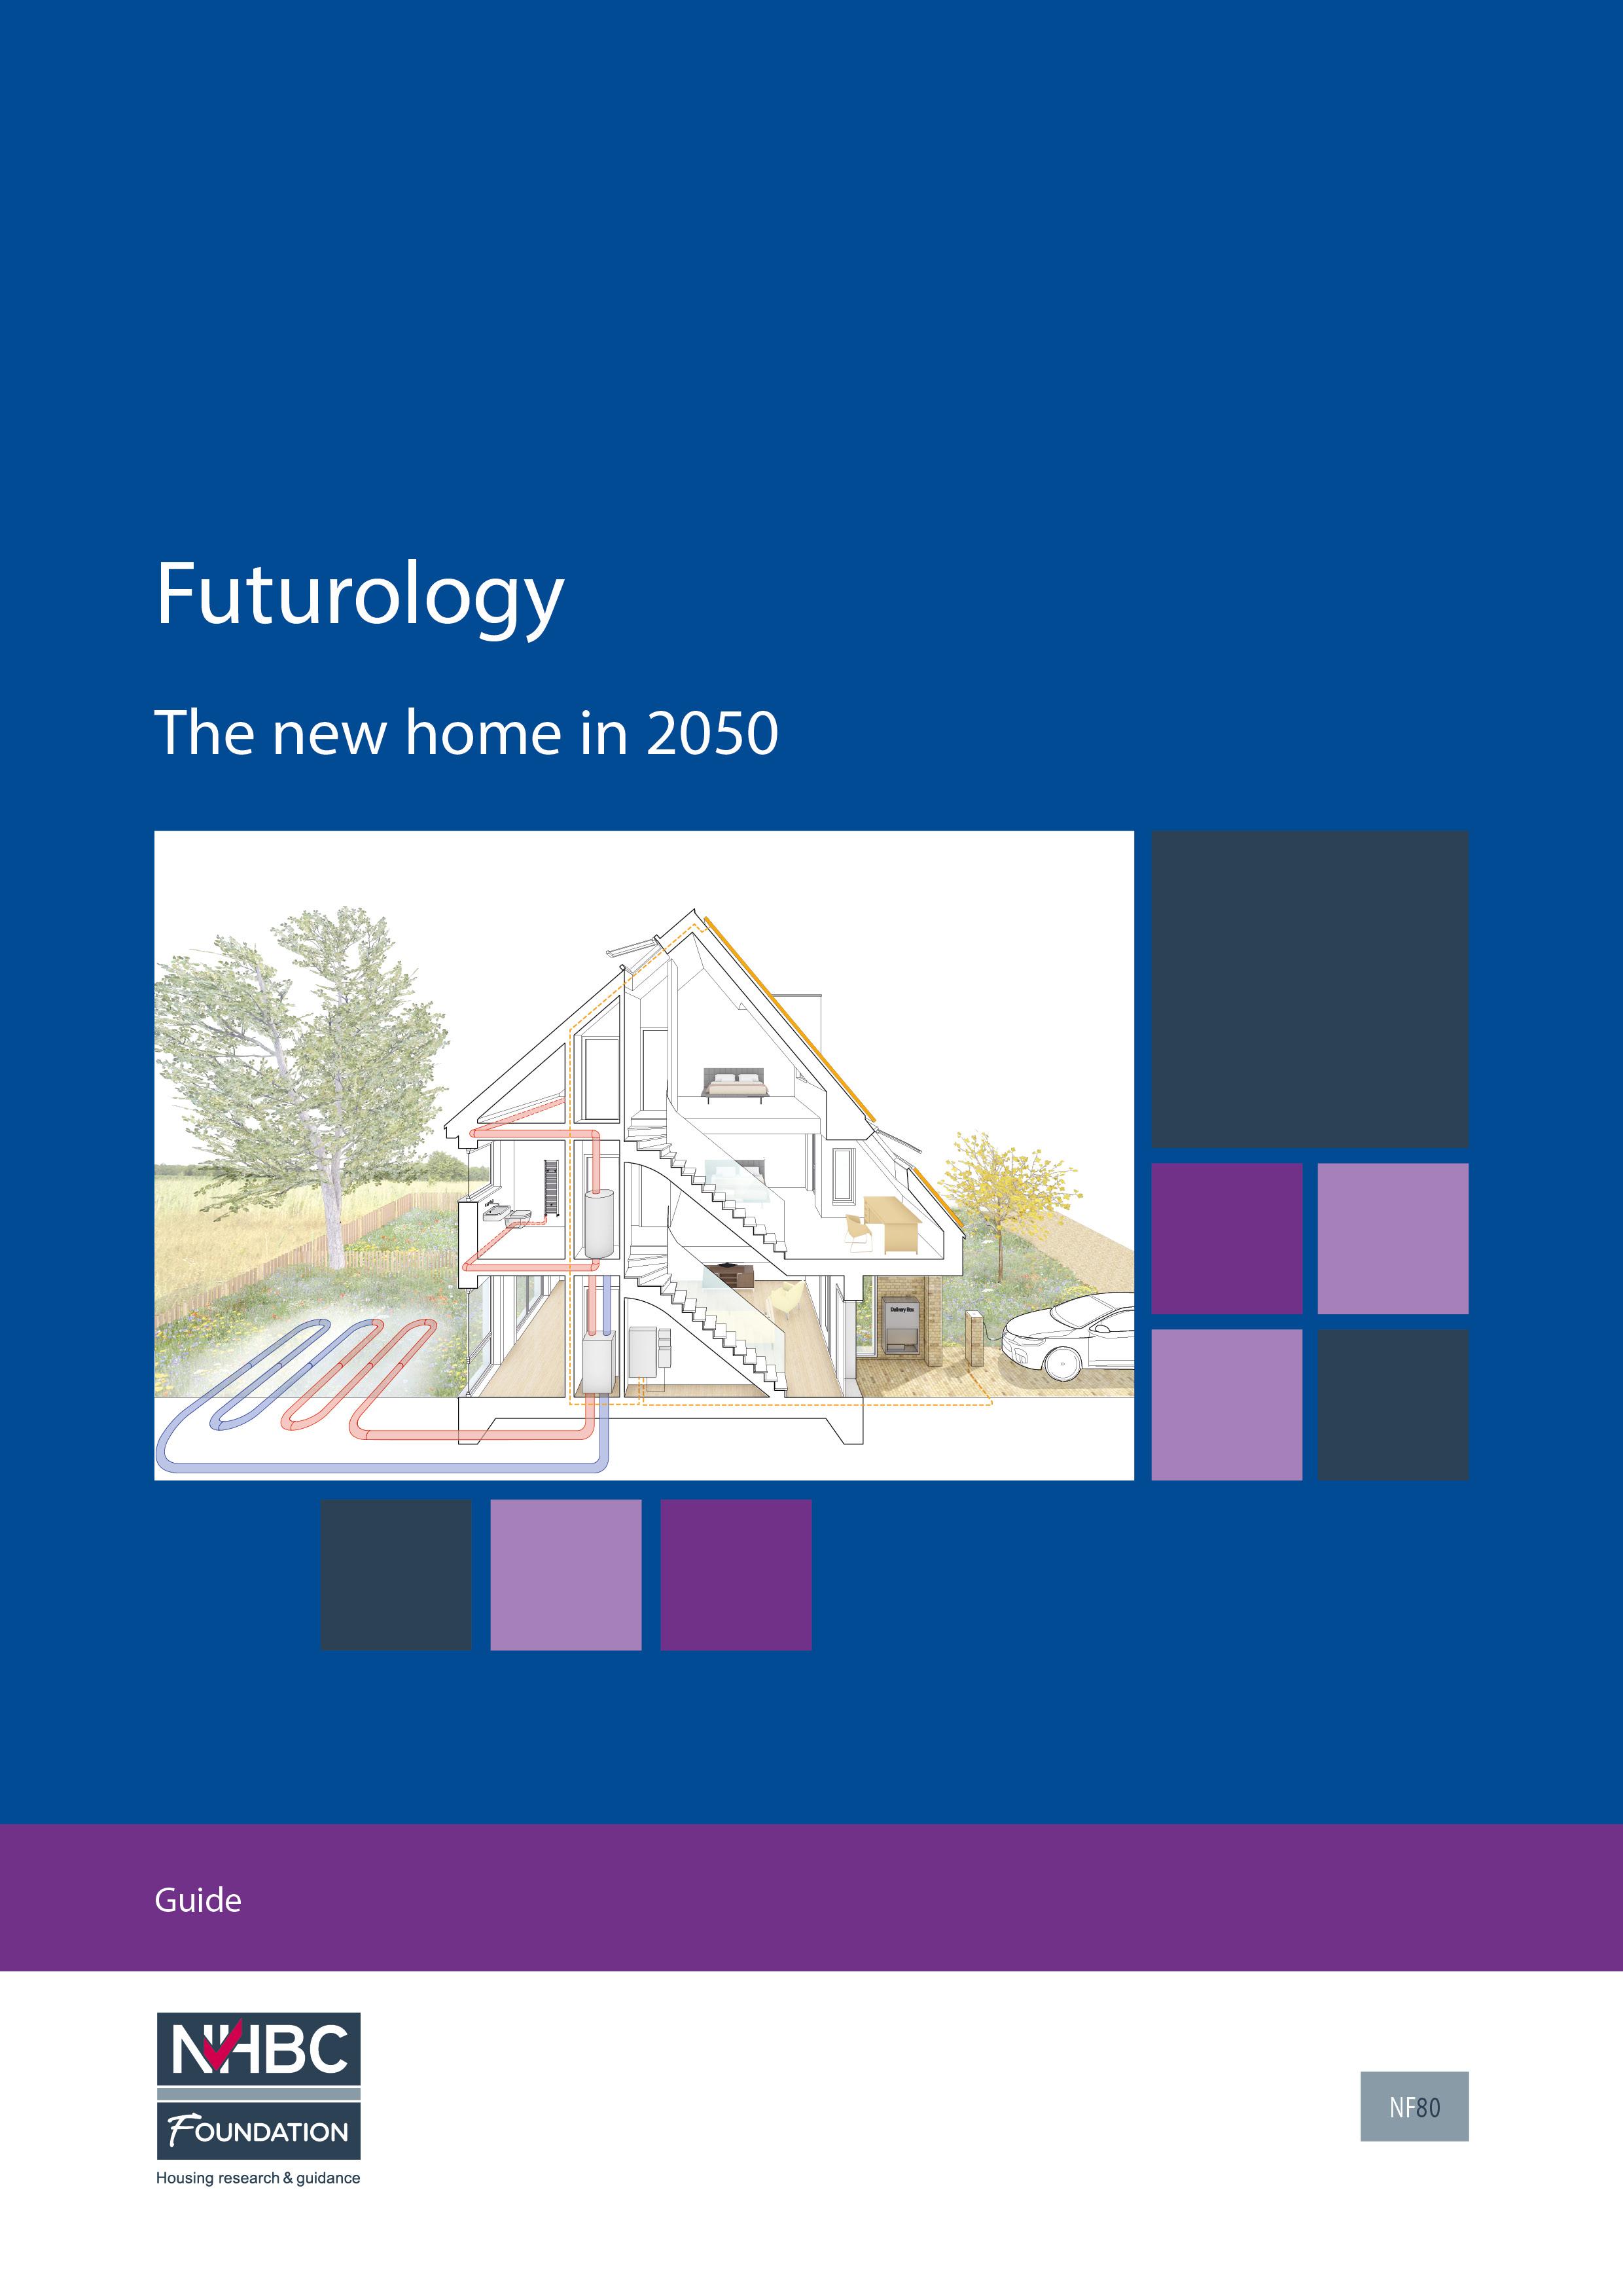 180508 2344_Futurology_PDF-FINAL.jpg